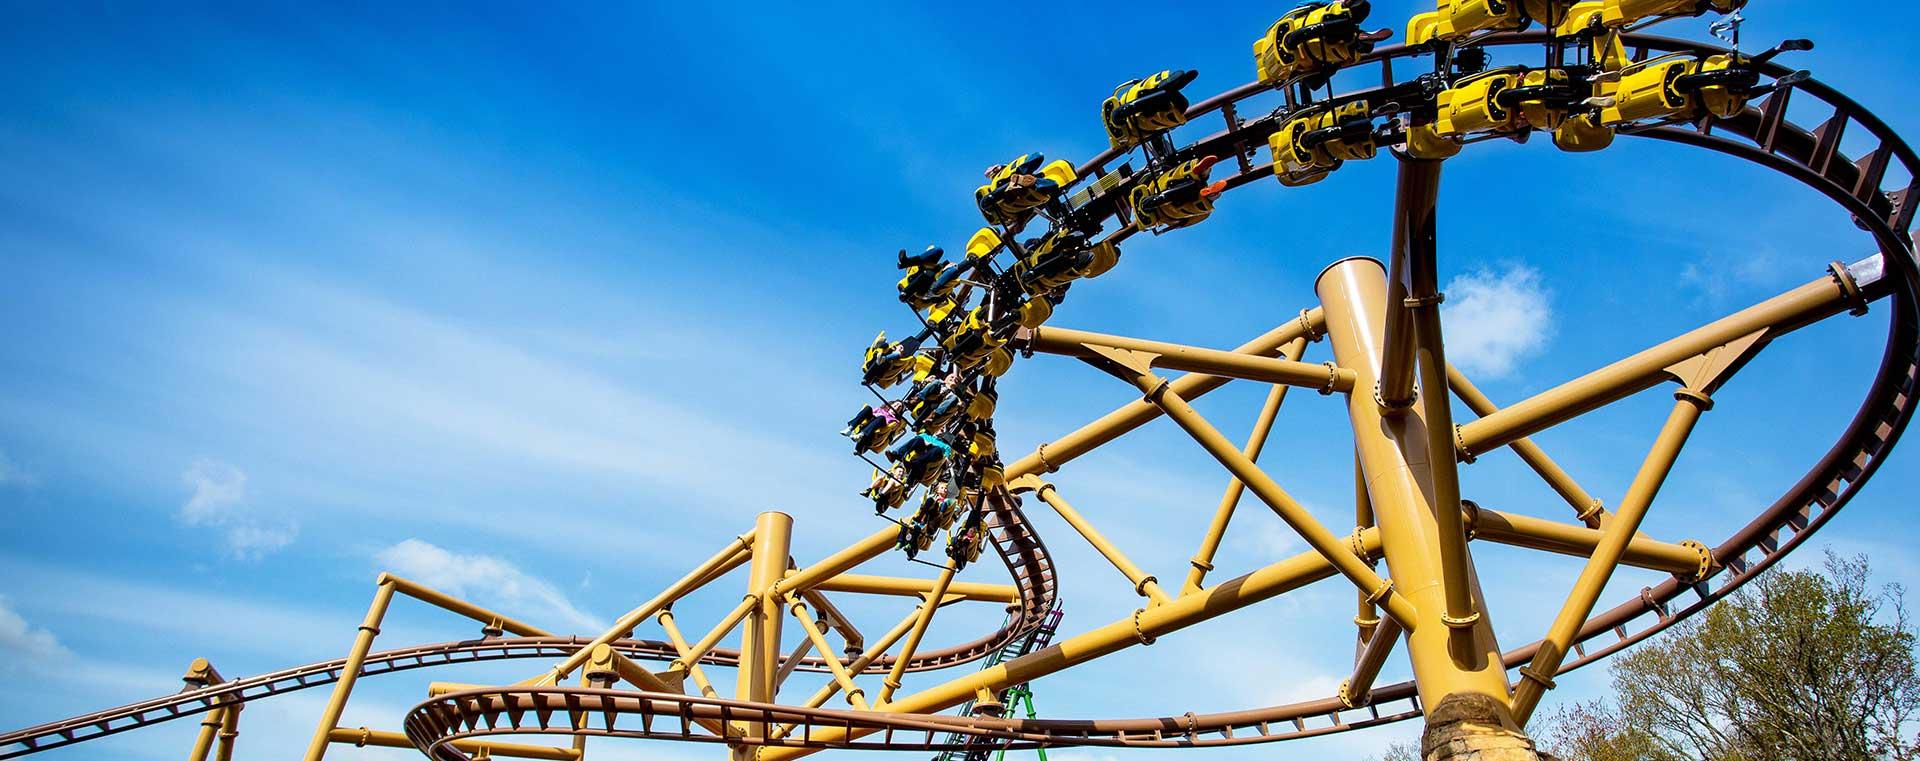 roller-coaster-paultons-park